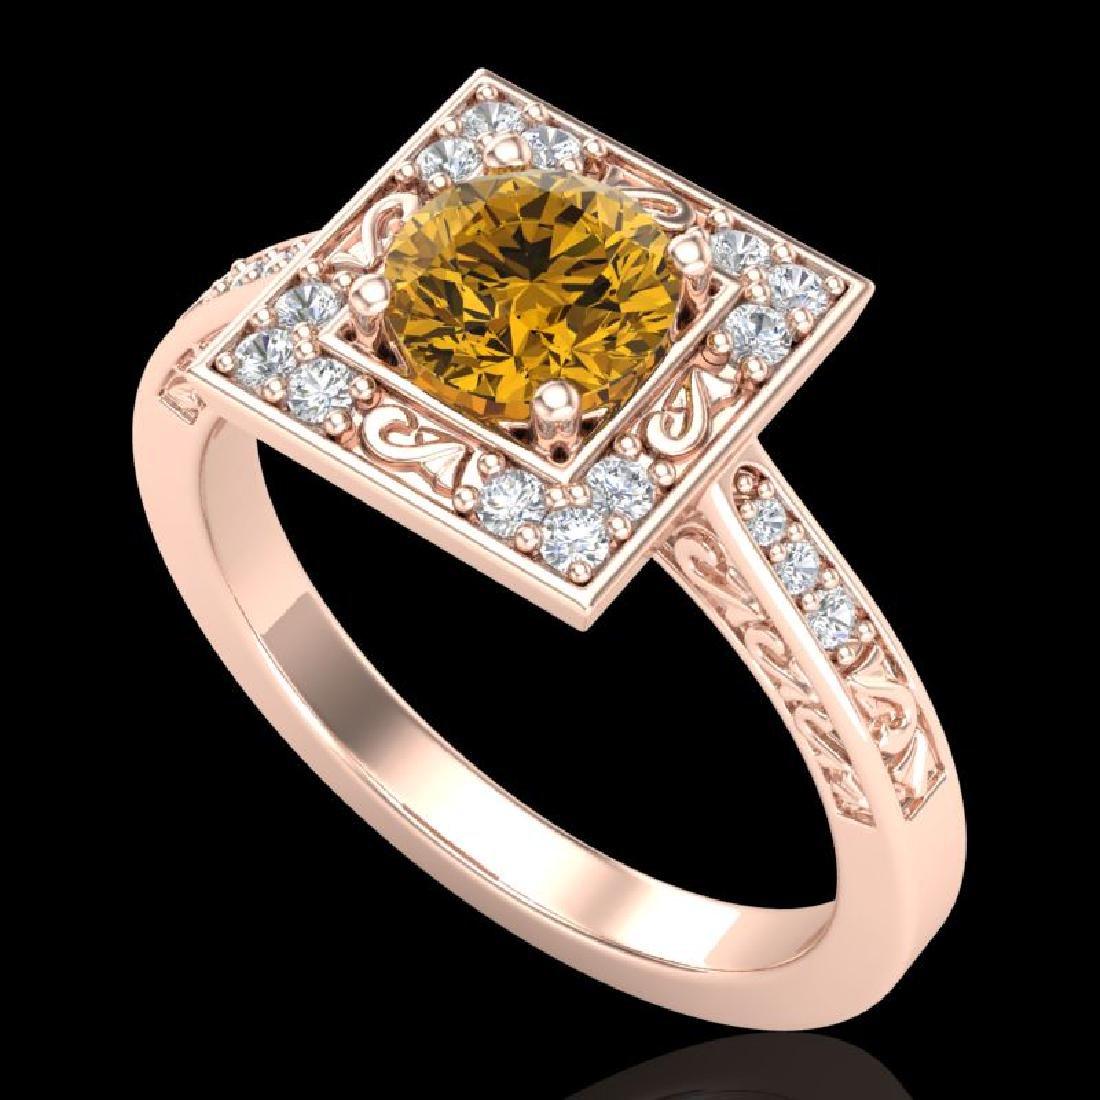 1.1 CTW Intense Fancy Yellow Diamond Engagement Art